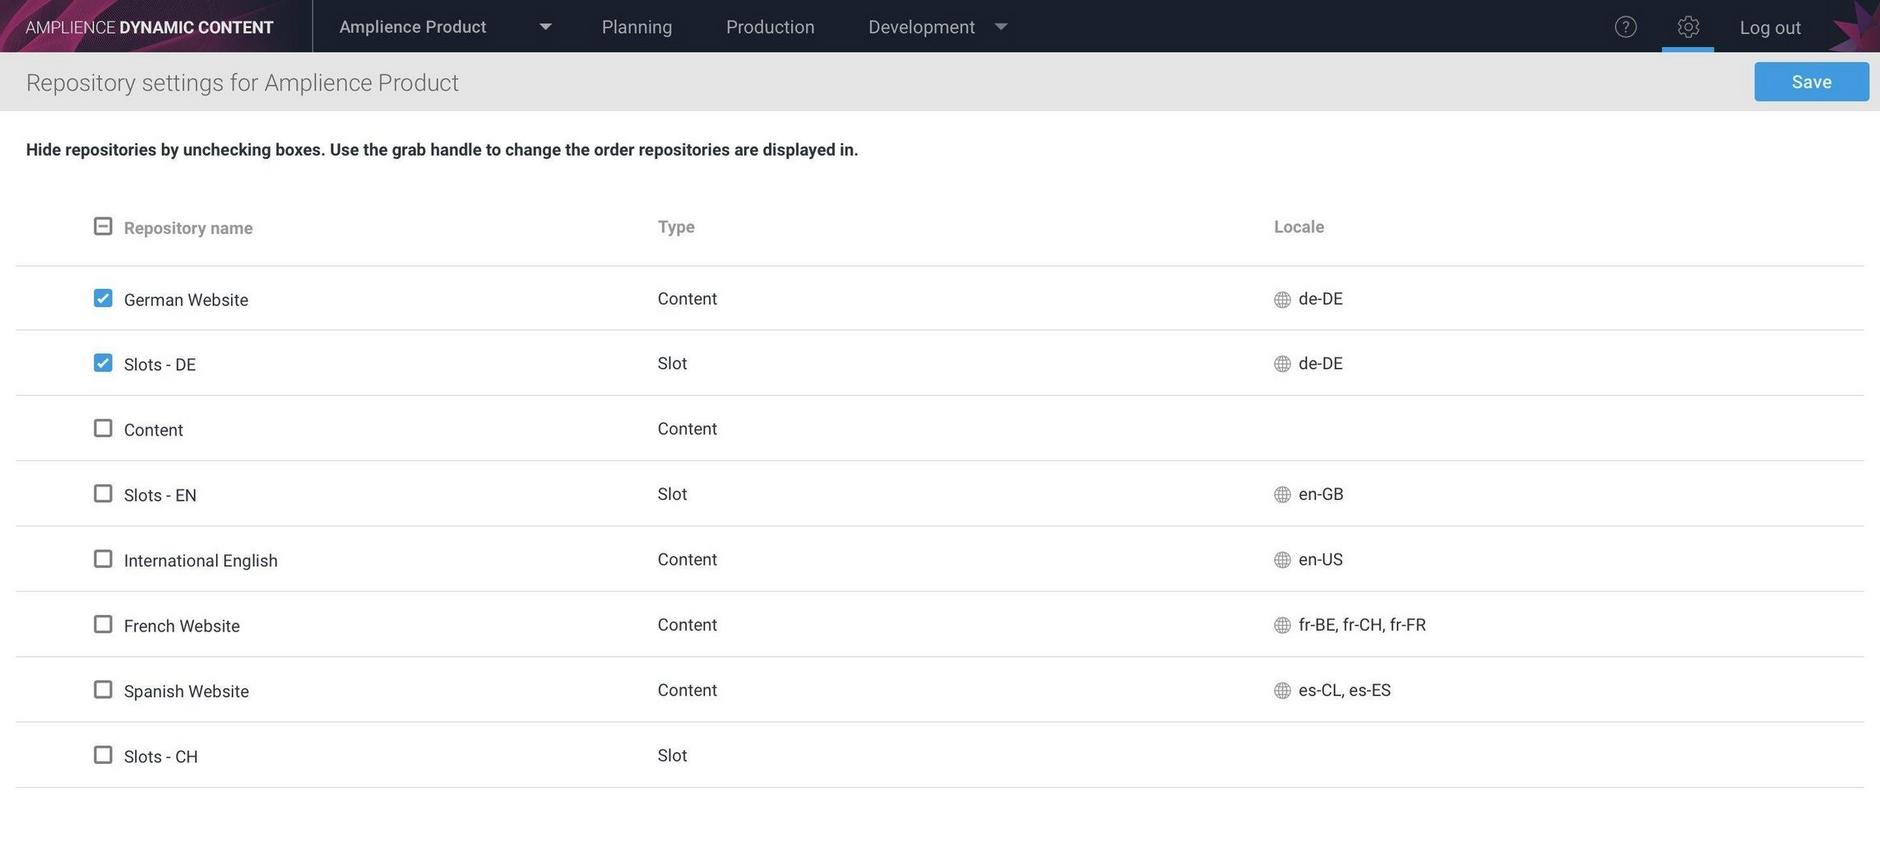 The repository settings window